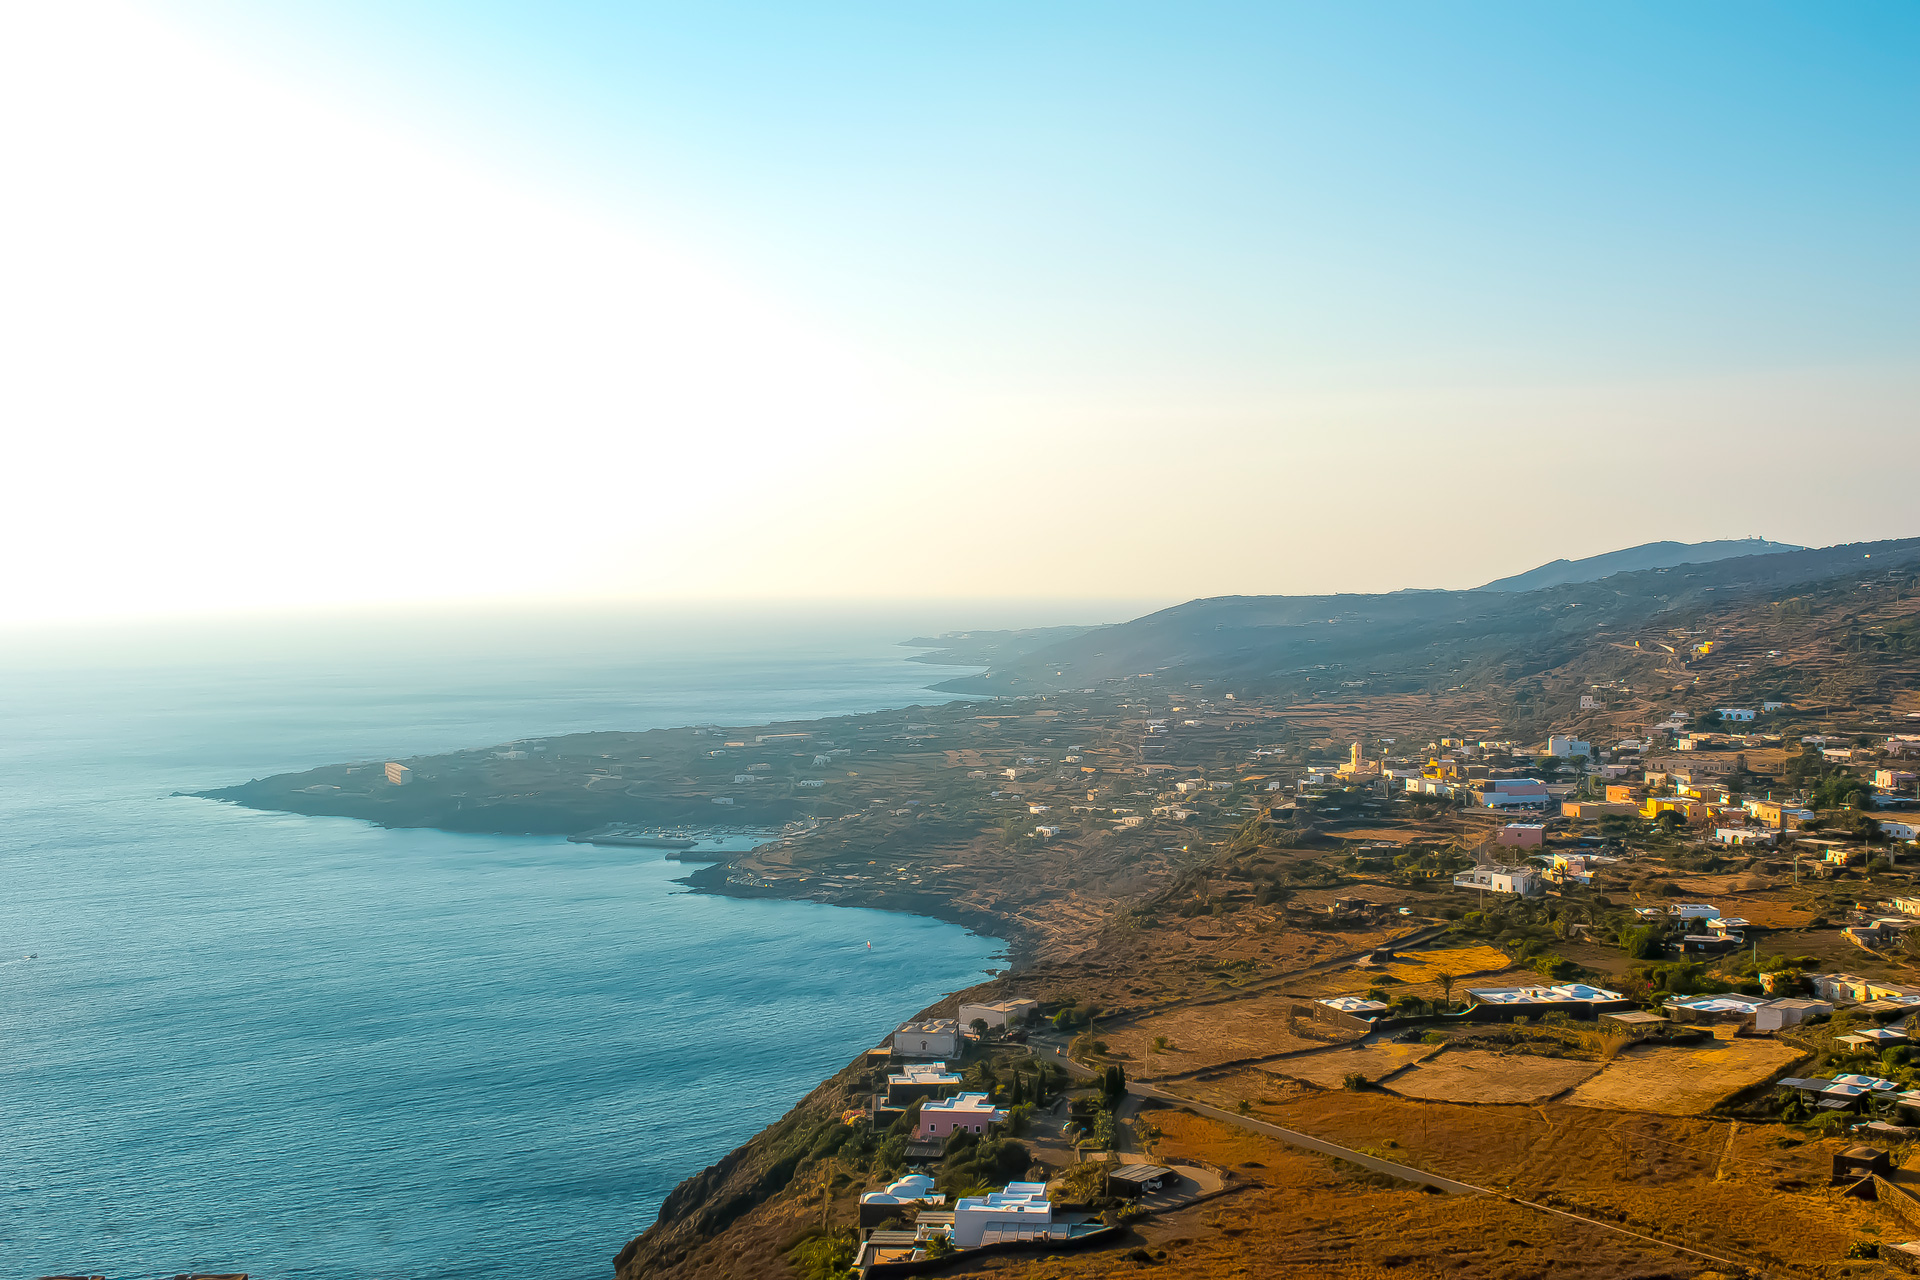 Realestate-Pantelleria-Vendita-Affitto-Dammusi-Scauri-Estate